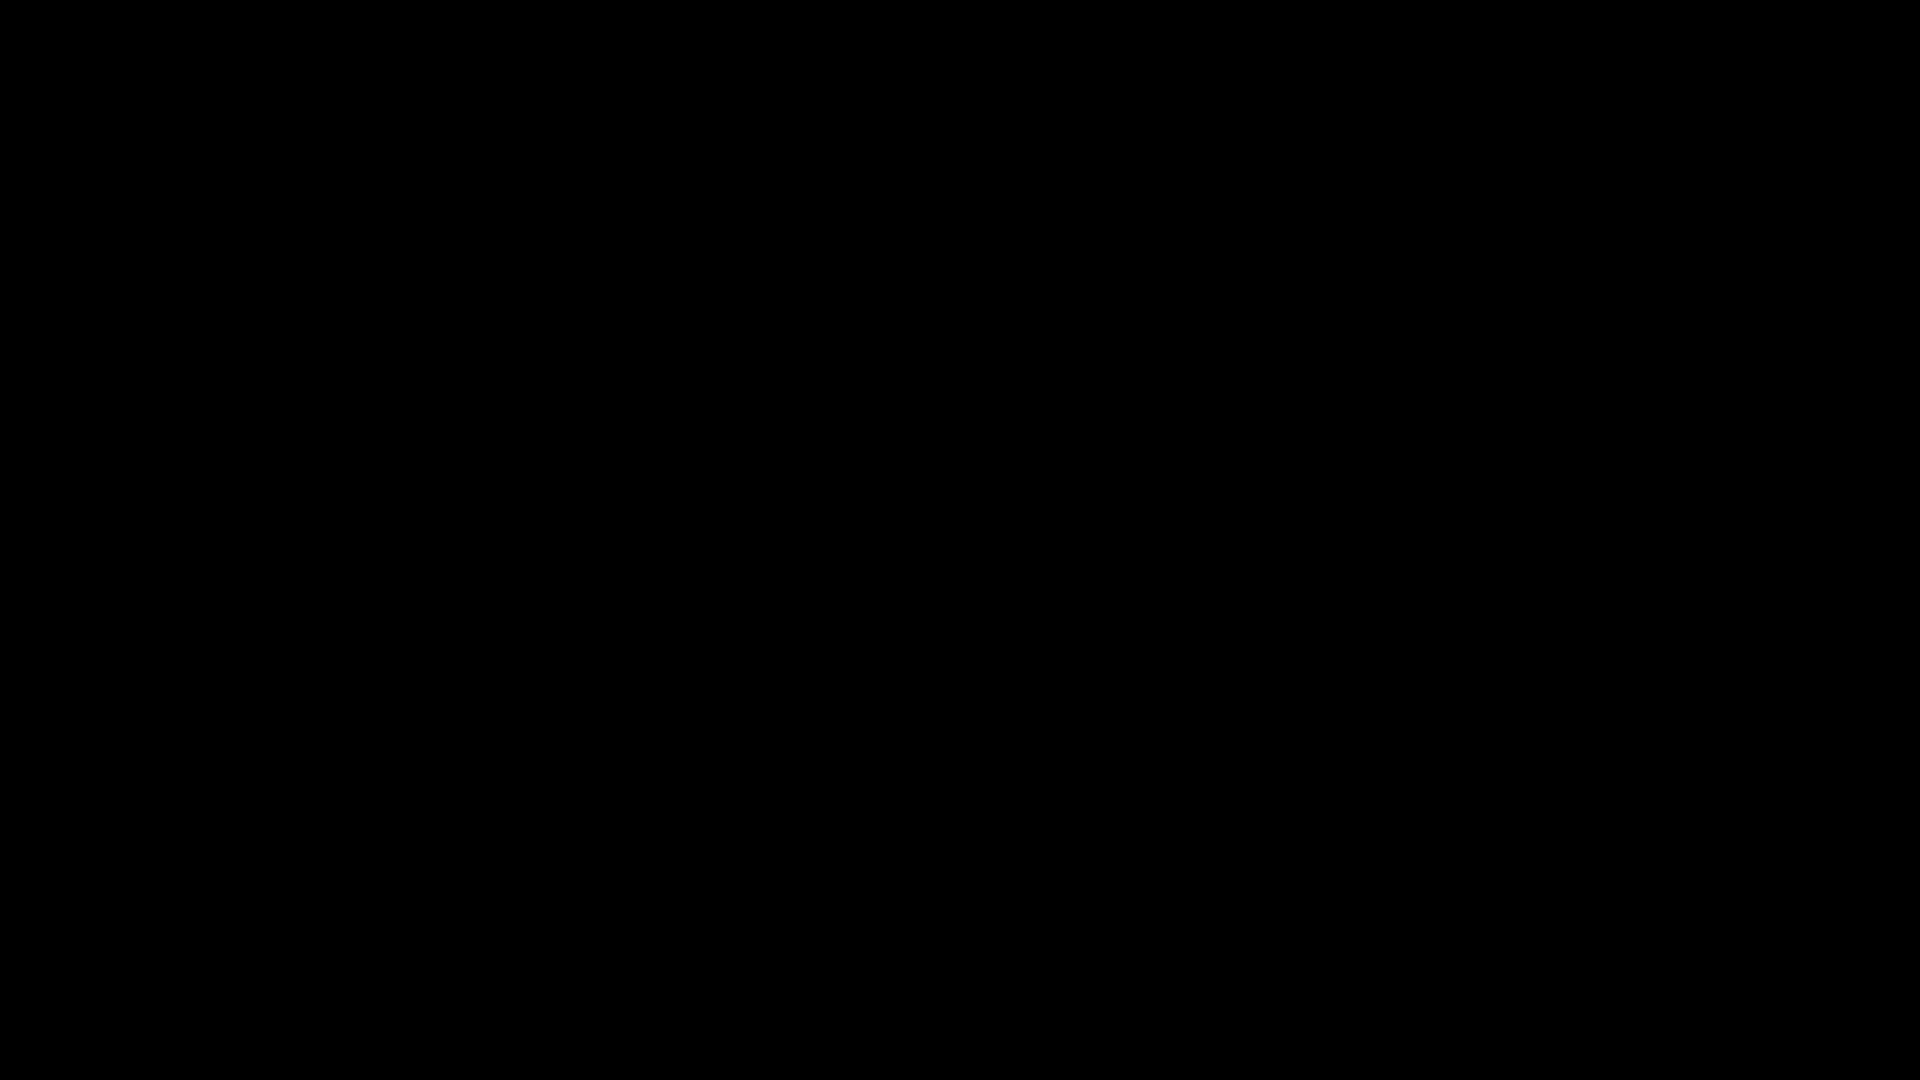 Simple Black Wallpapers - Wallpaper Cave